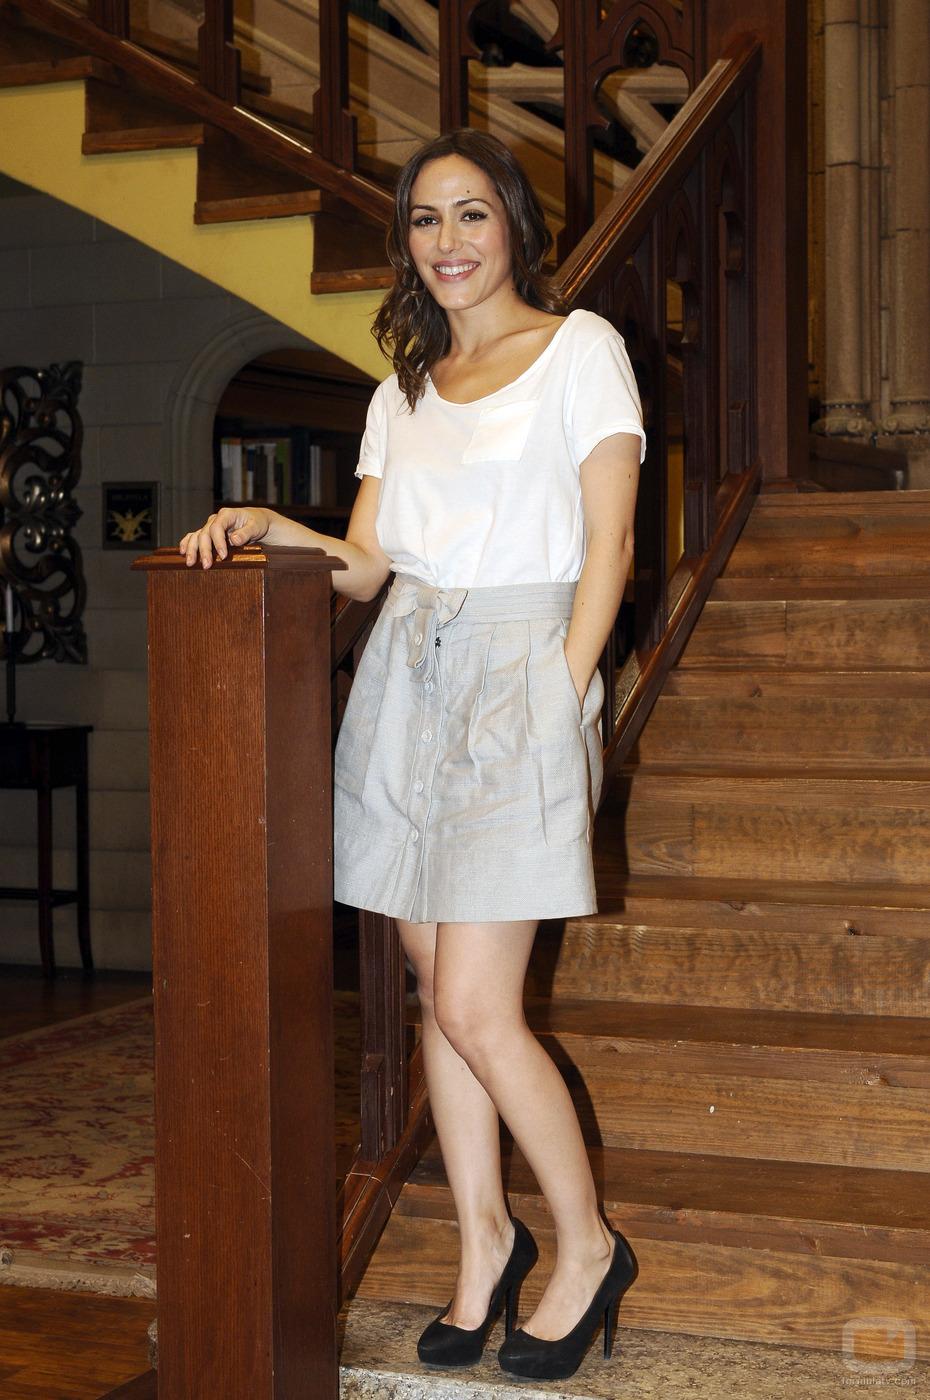 Irene Montala